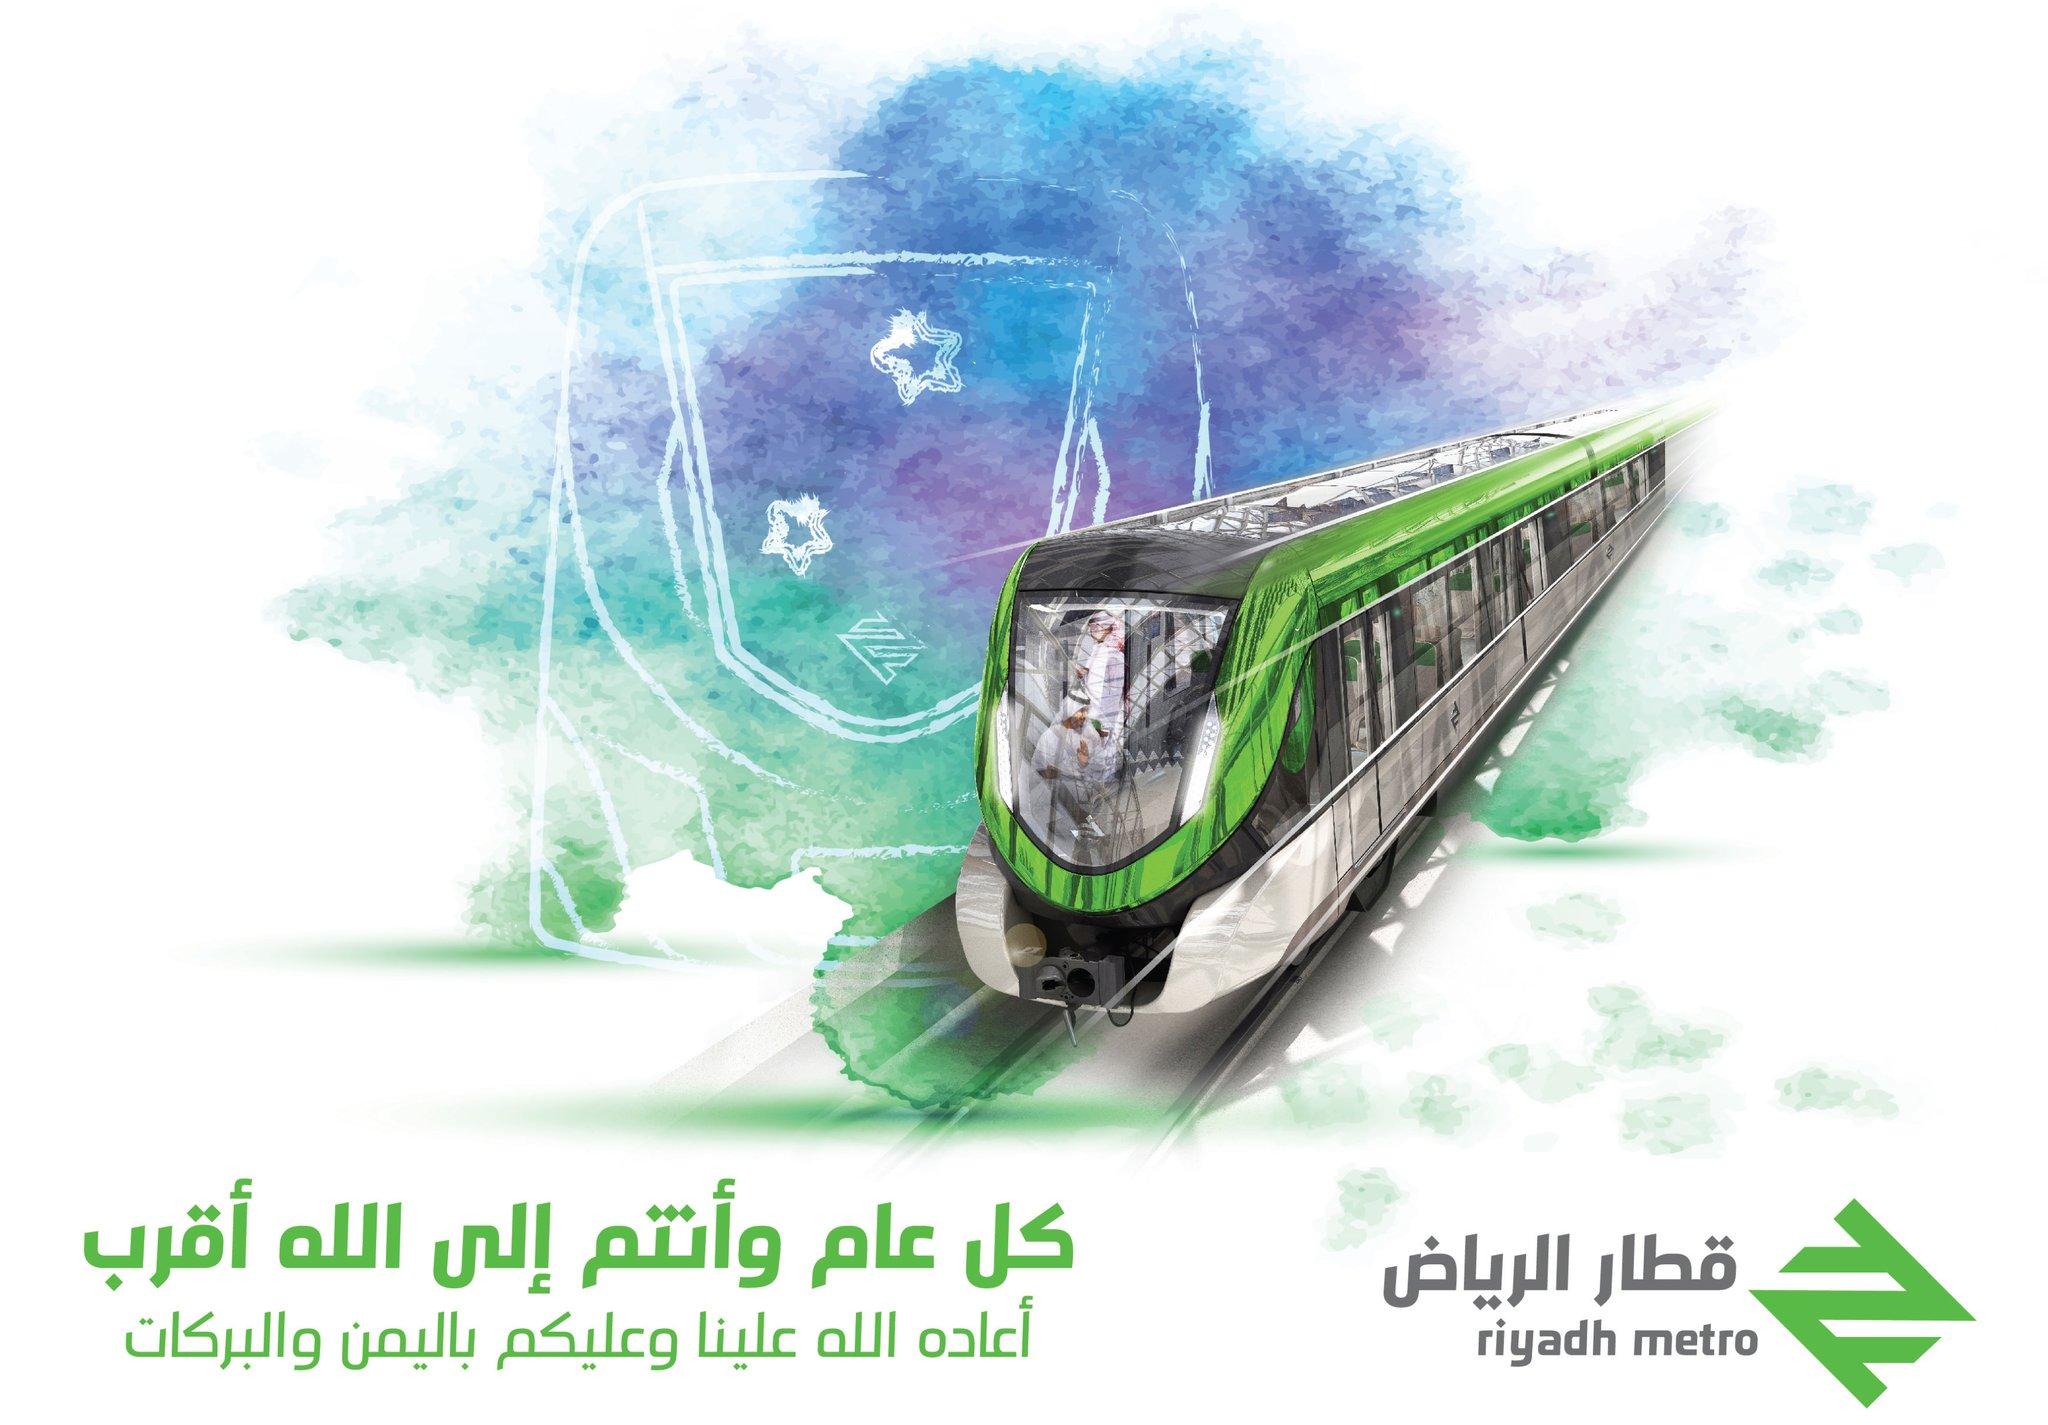 RiyadhTransport_2017-May-26.jpg